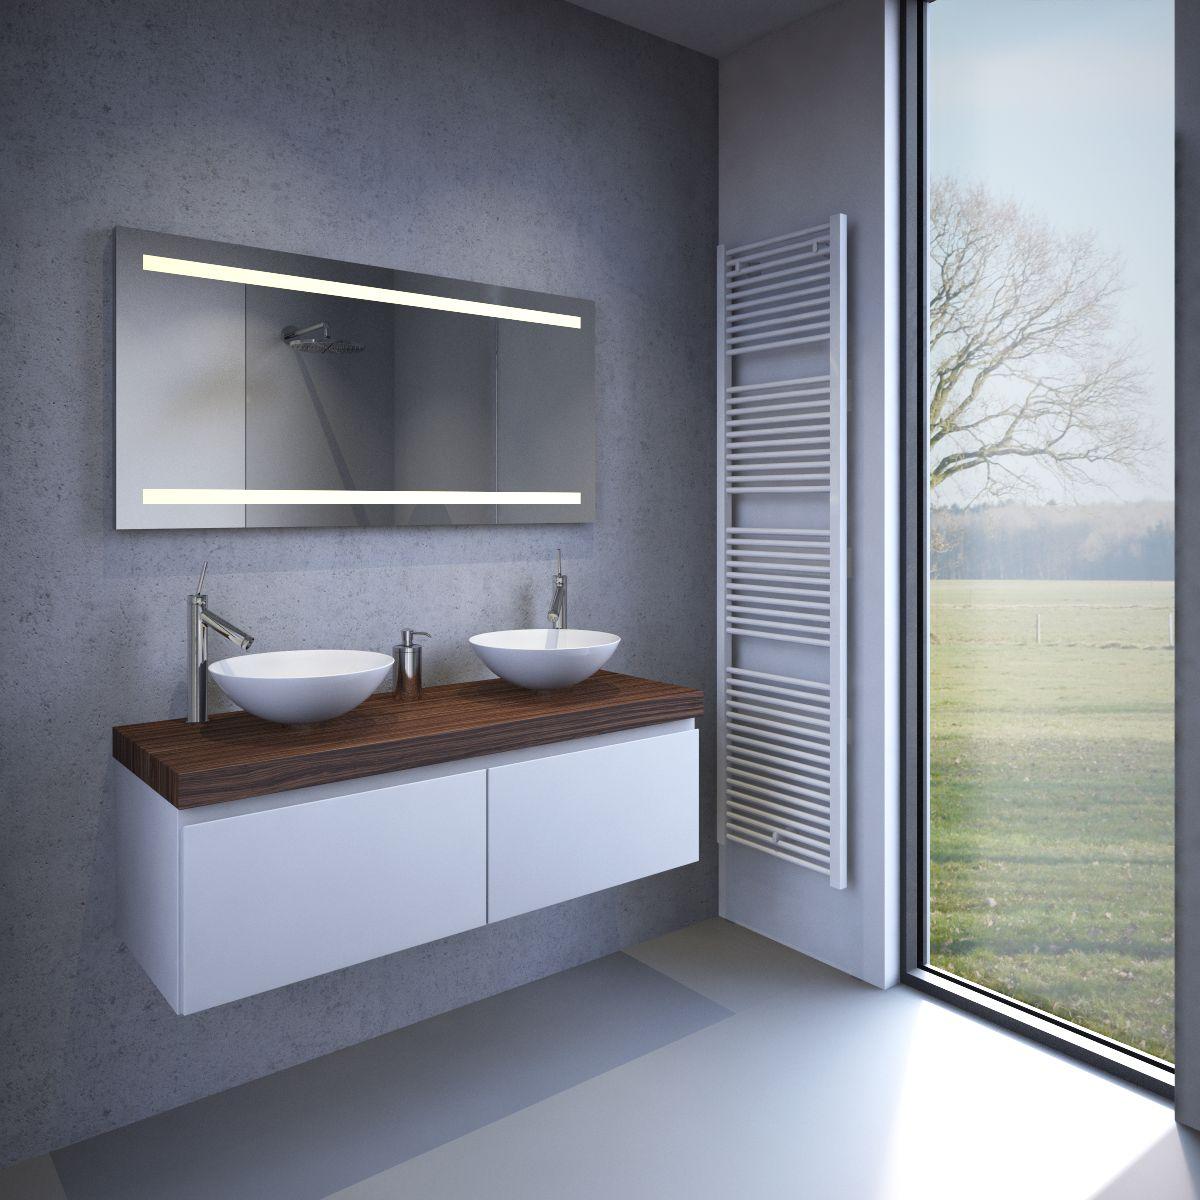 Badkamer led spiegel met verwarming en sensor 120x60 cm for Spiegelkast 60 cm breed